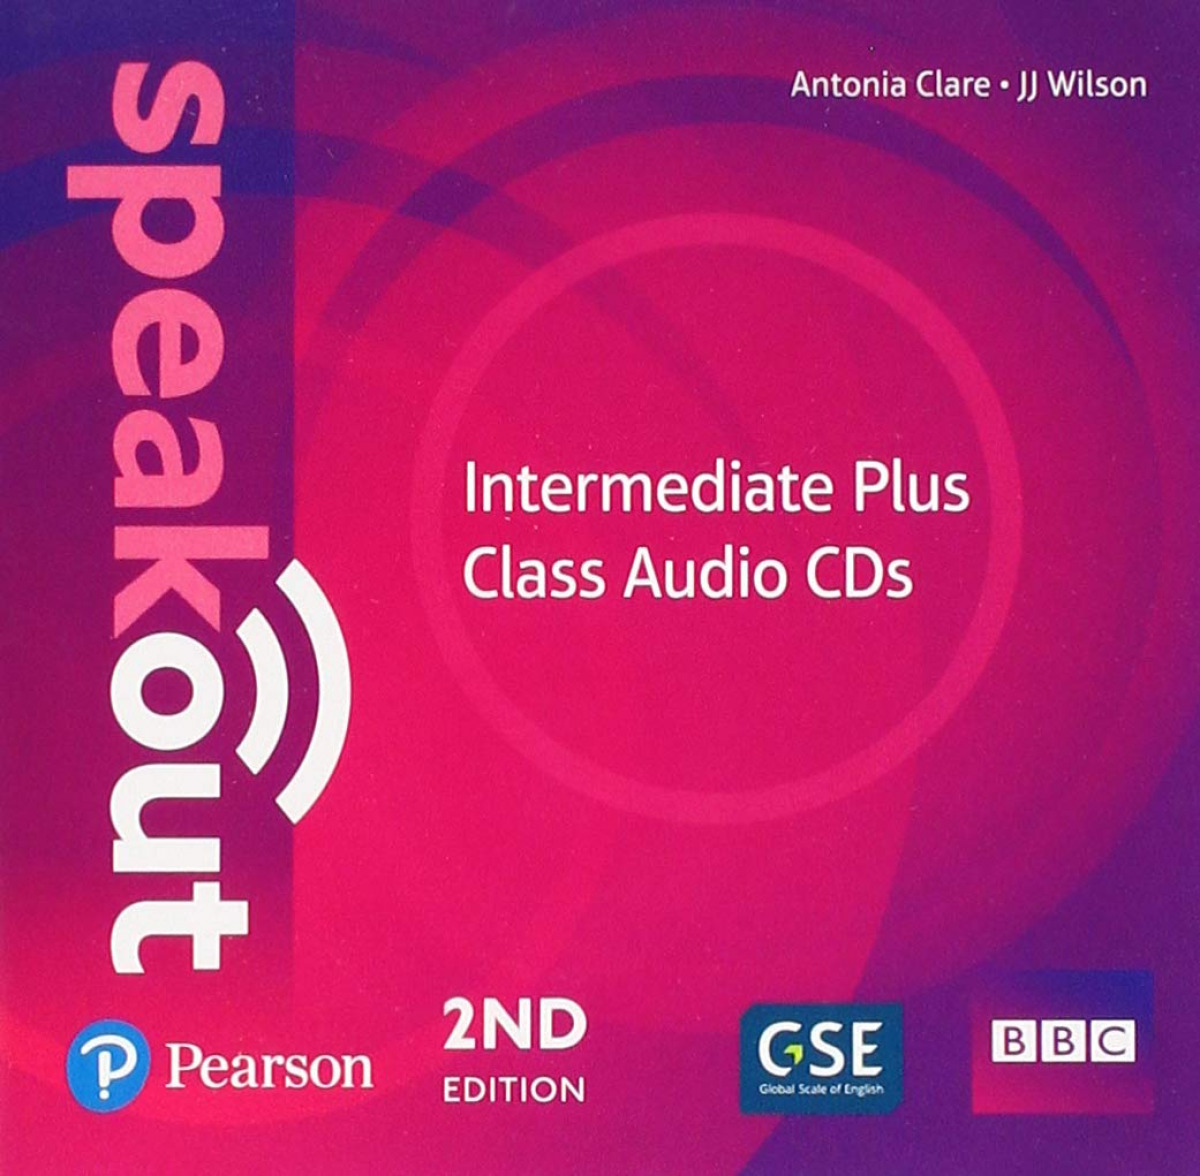 SPEAKOUT INTERMEDIATE PLUS 2ND EDITION CLASS CDS